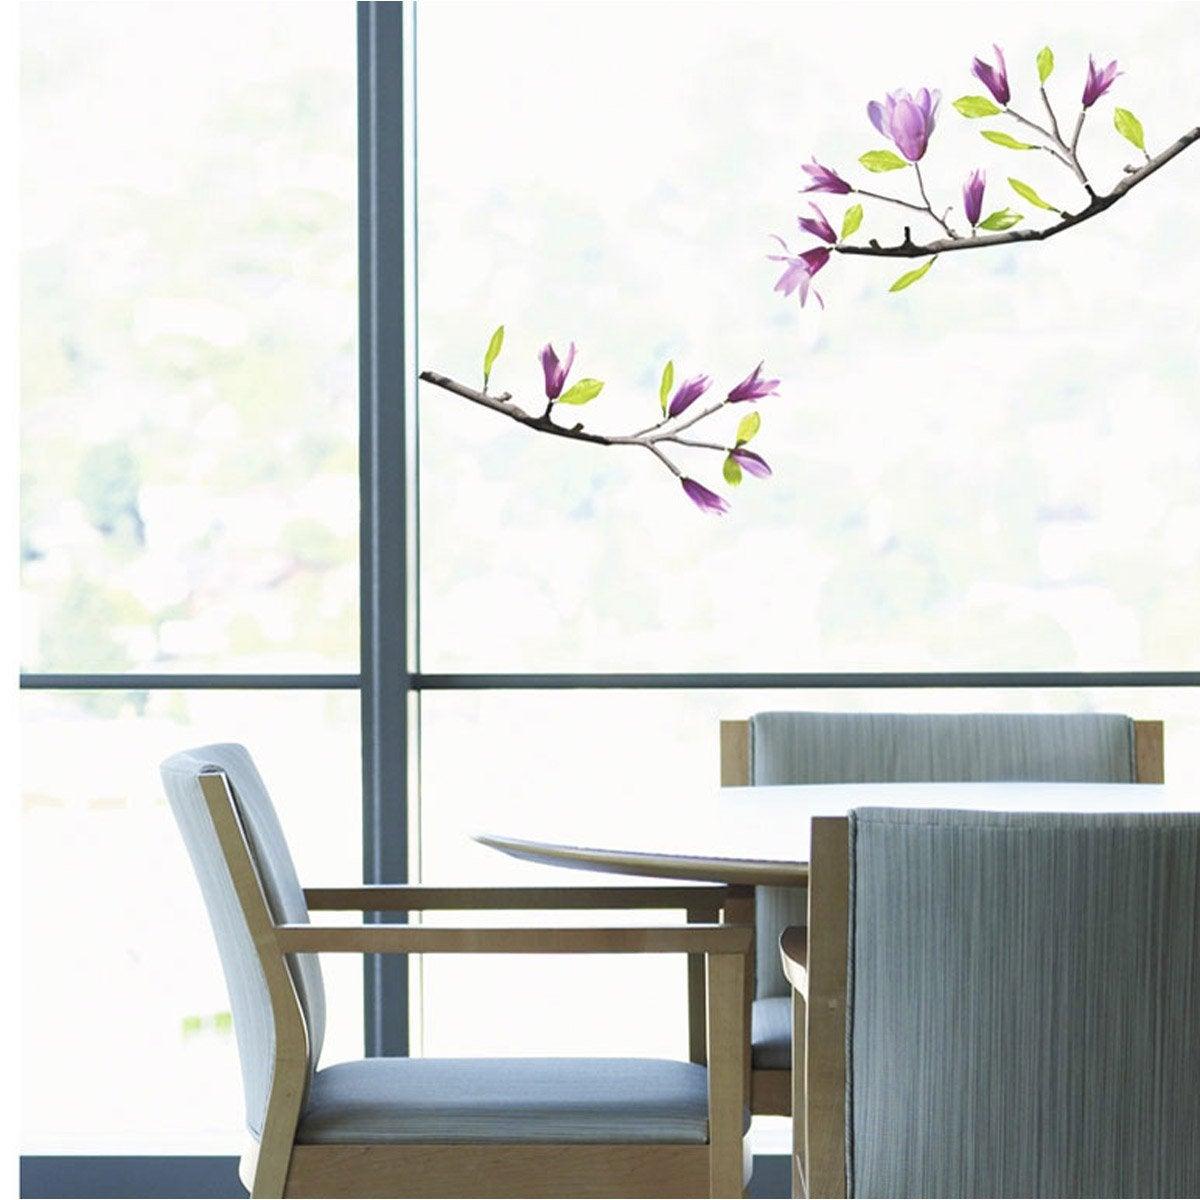 sticker magnolia 23 5 x 67 cm leroy merlin. Black Bedroom Furniture Sets. Home Design Ideas